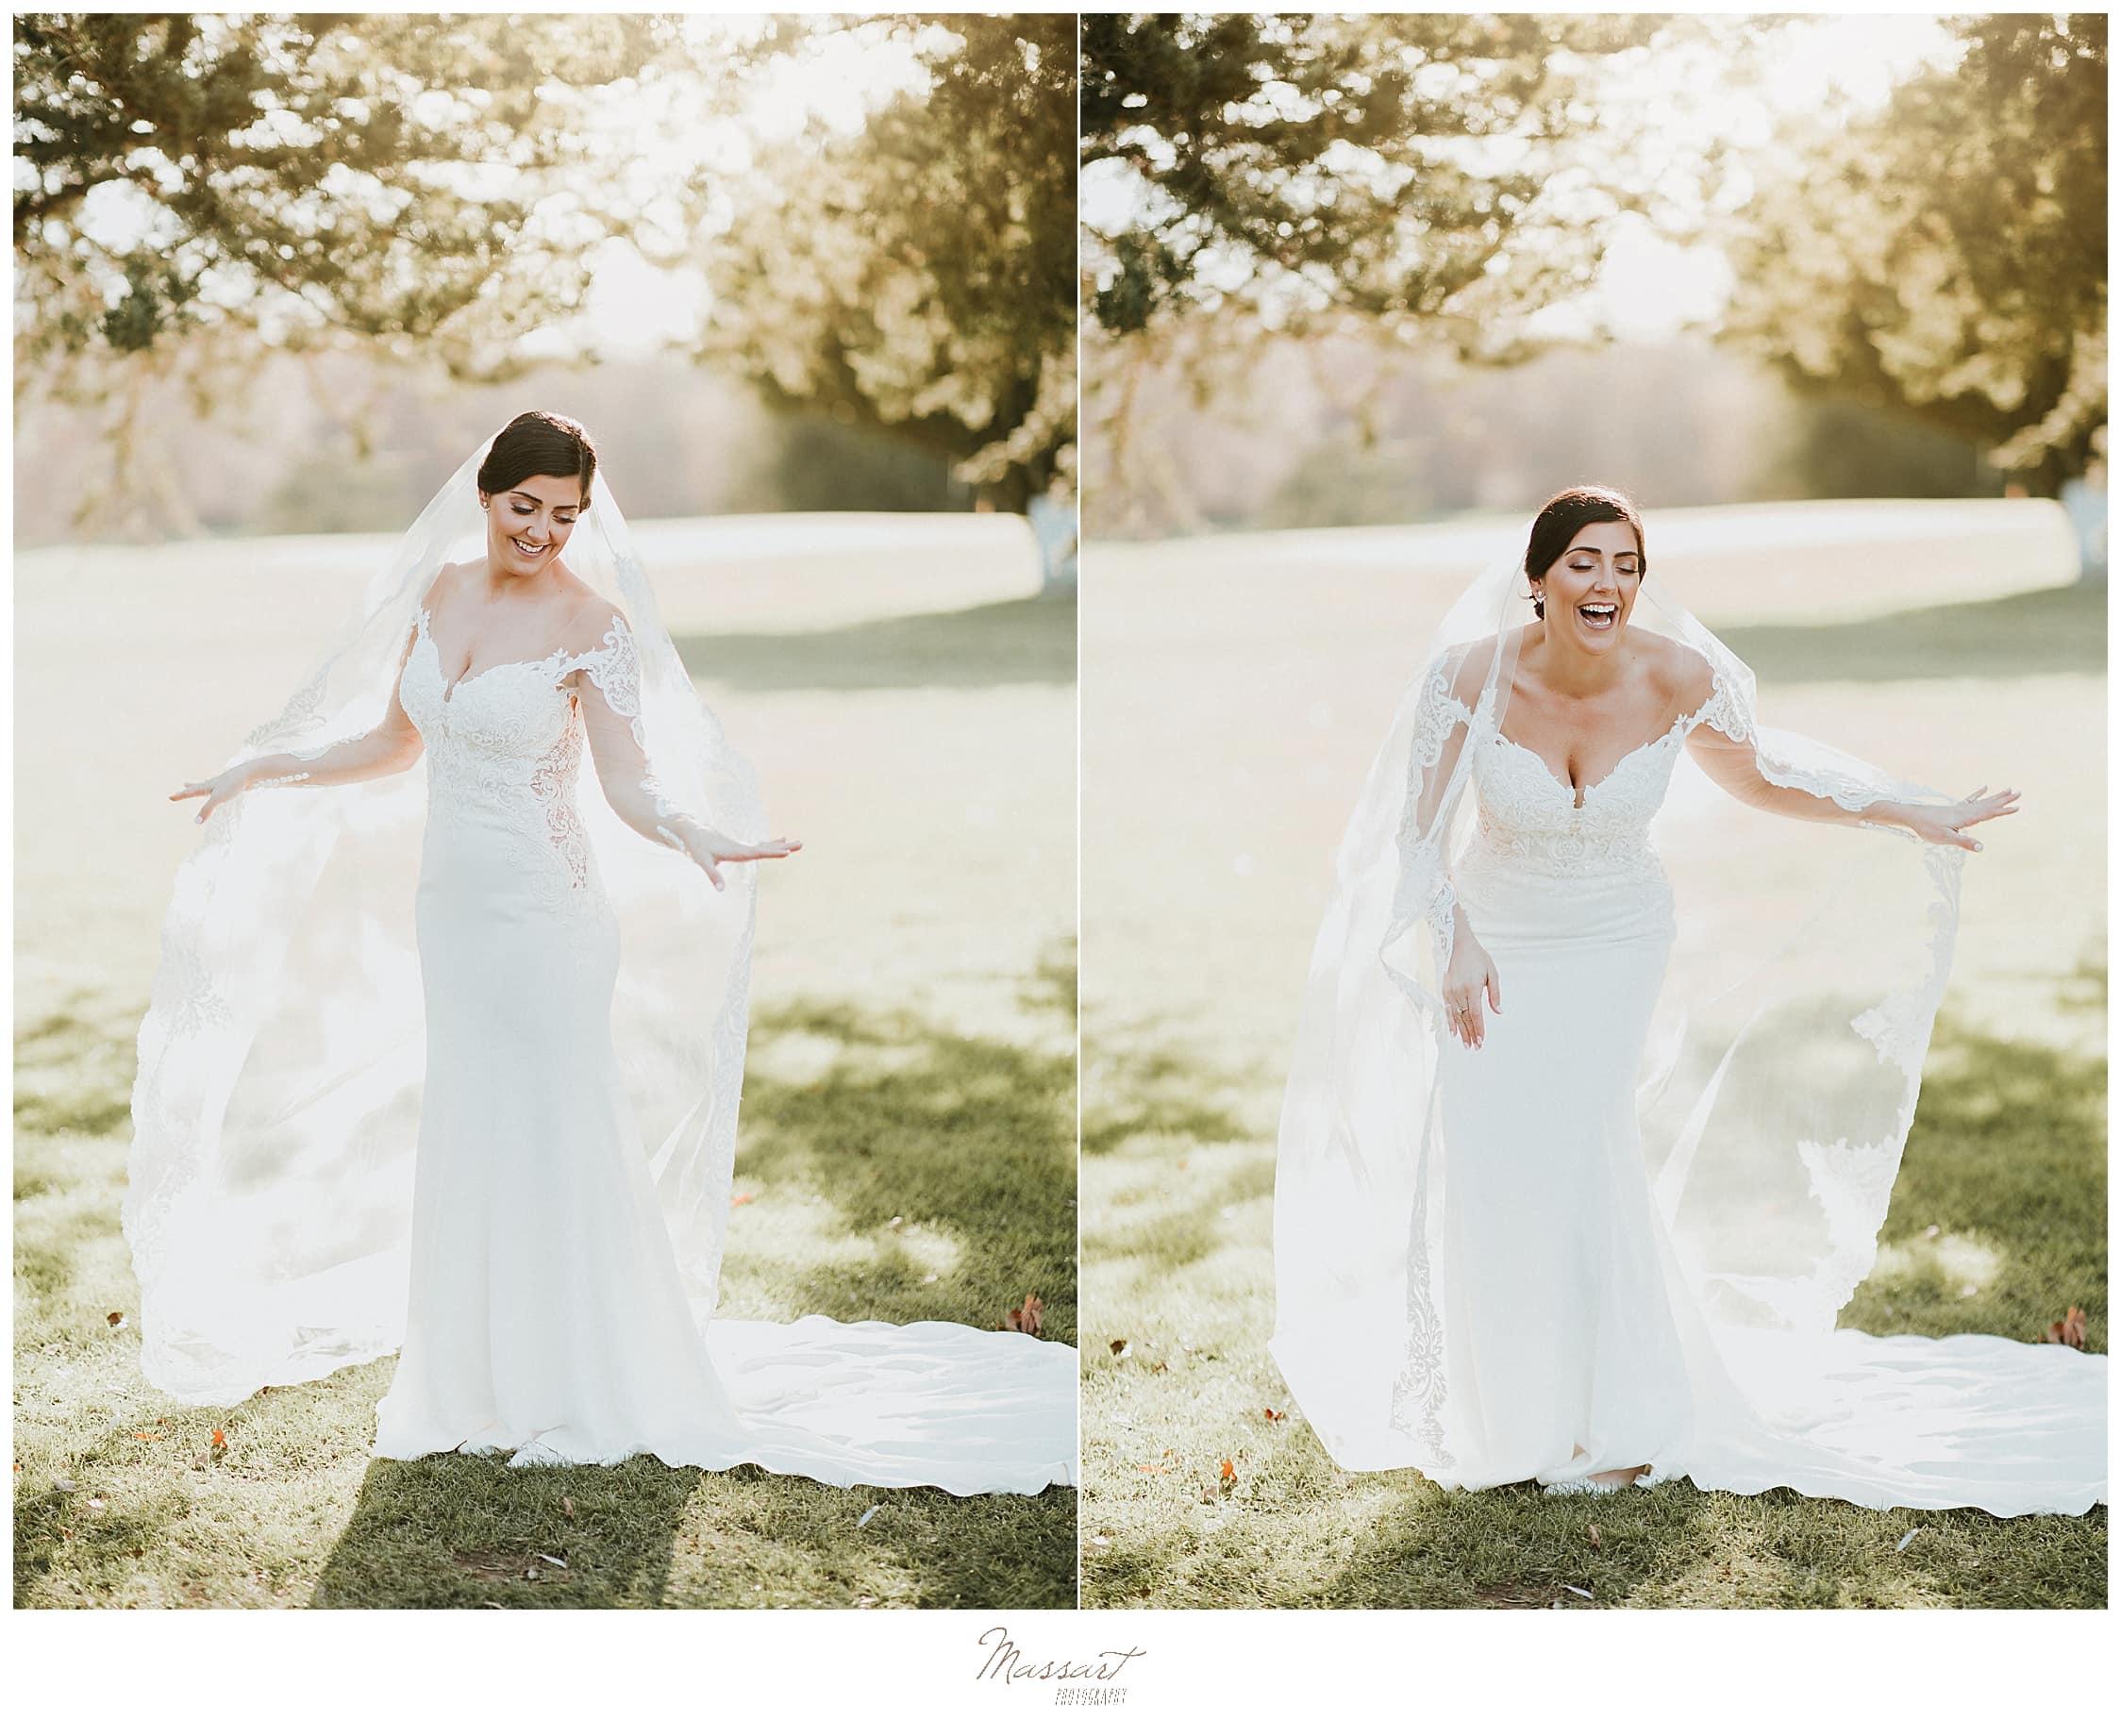 joyful bridal portraits by Massart Photography in Foxboro MA